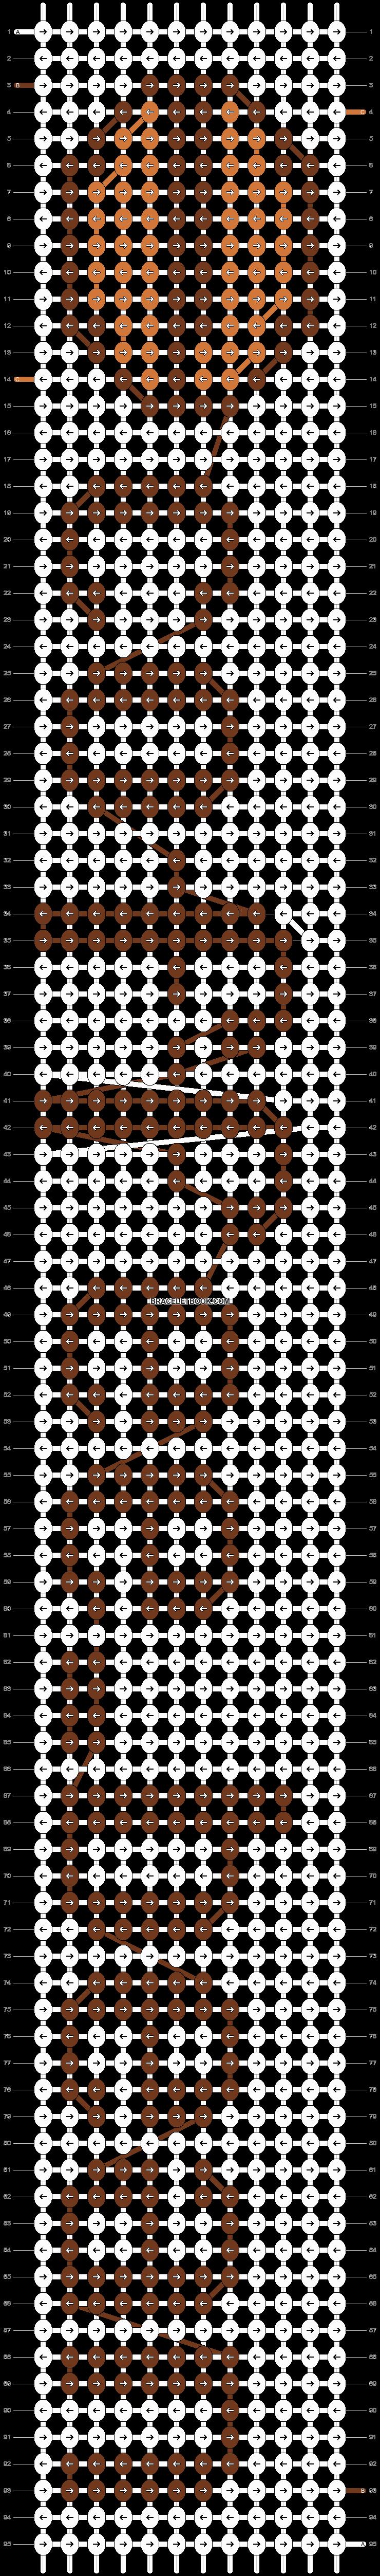 Alpha pattern #9742 pattern